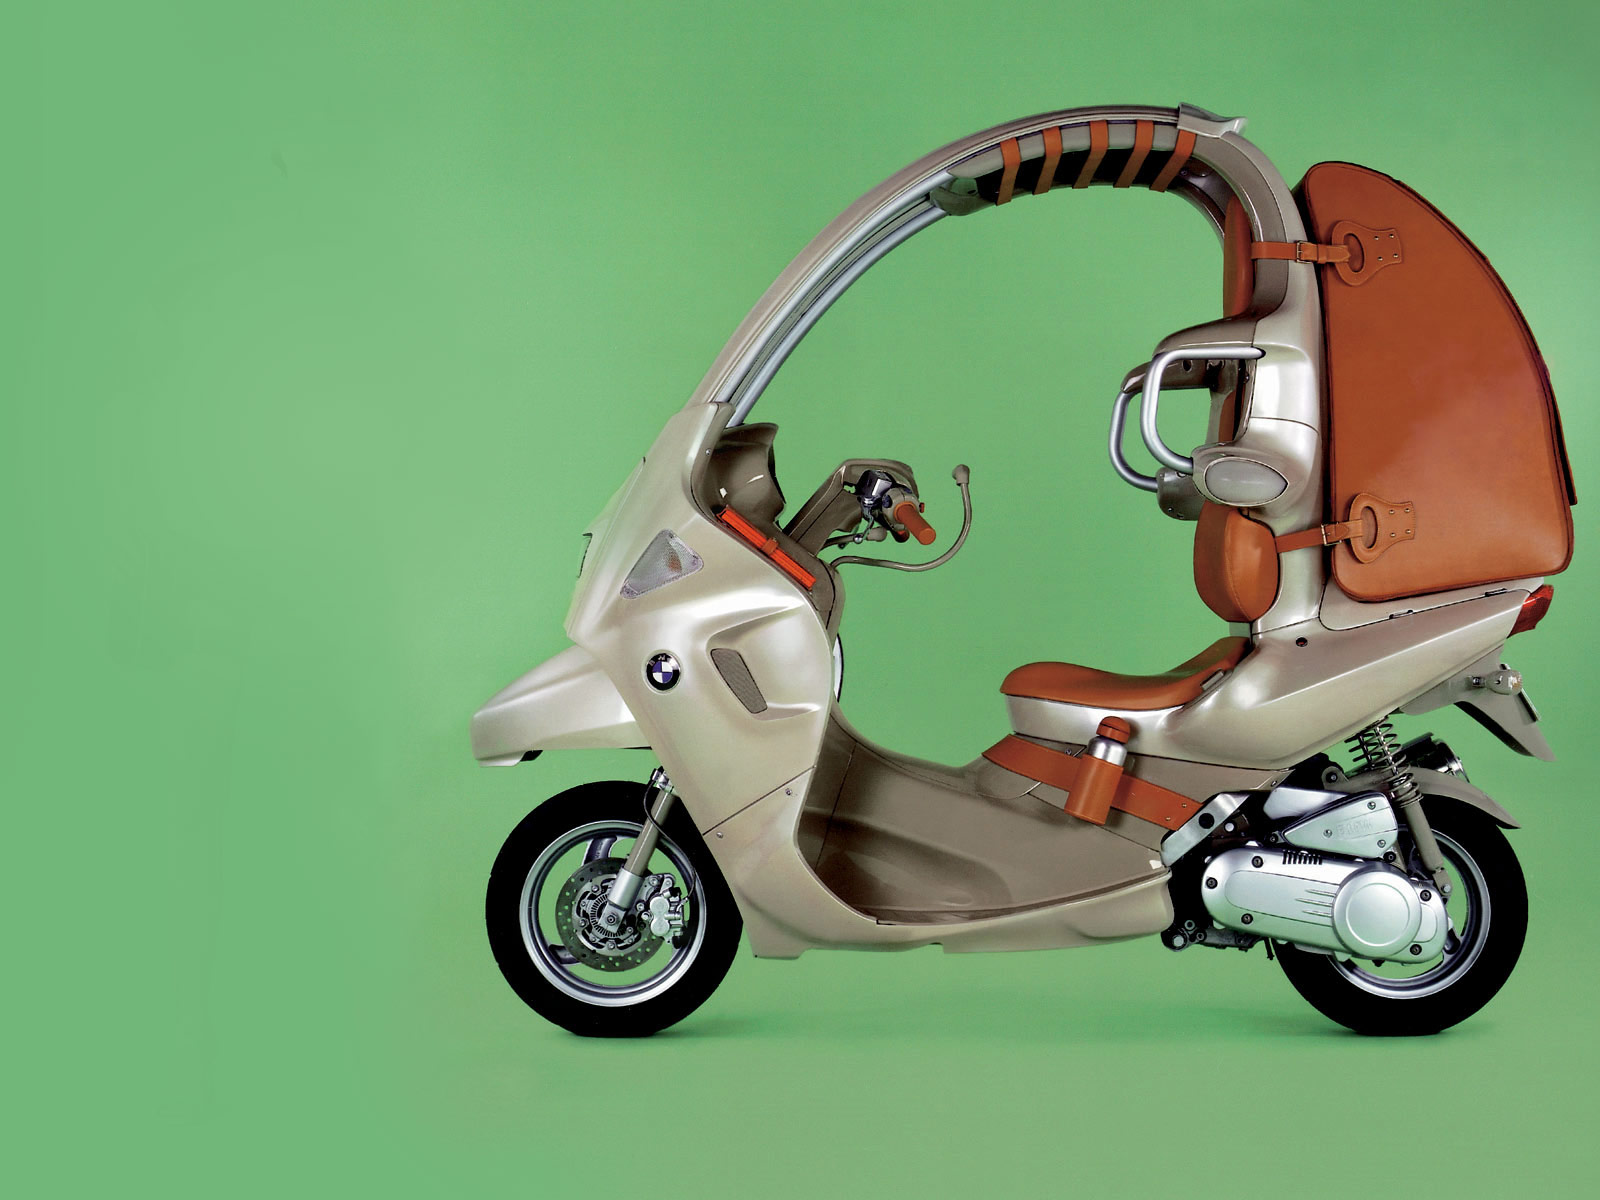 2000 bmw c1 nomade scooter picture insurance info. Black Bedroom Furniture Sets. Home Design Ideas